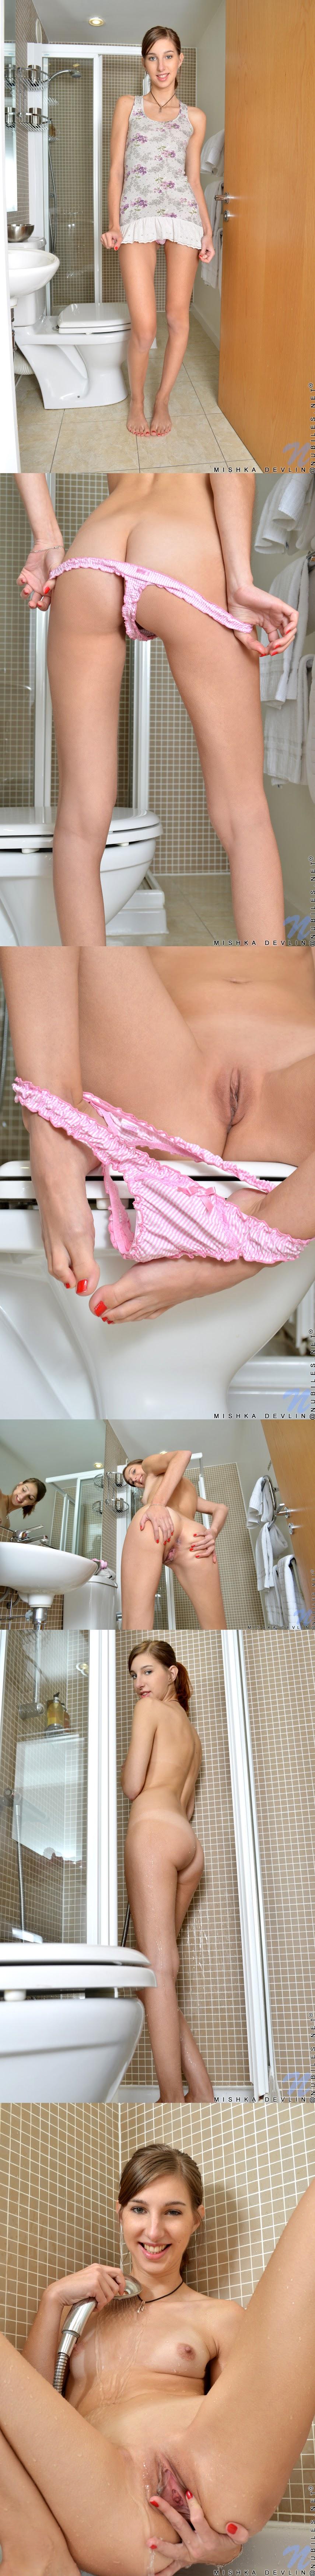 Nubiles.net  2013-02-28 Ksenija Ready To Touch HerselfReal Street Angels